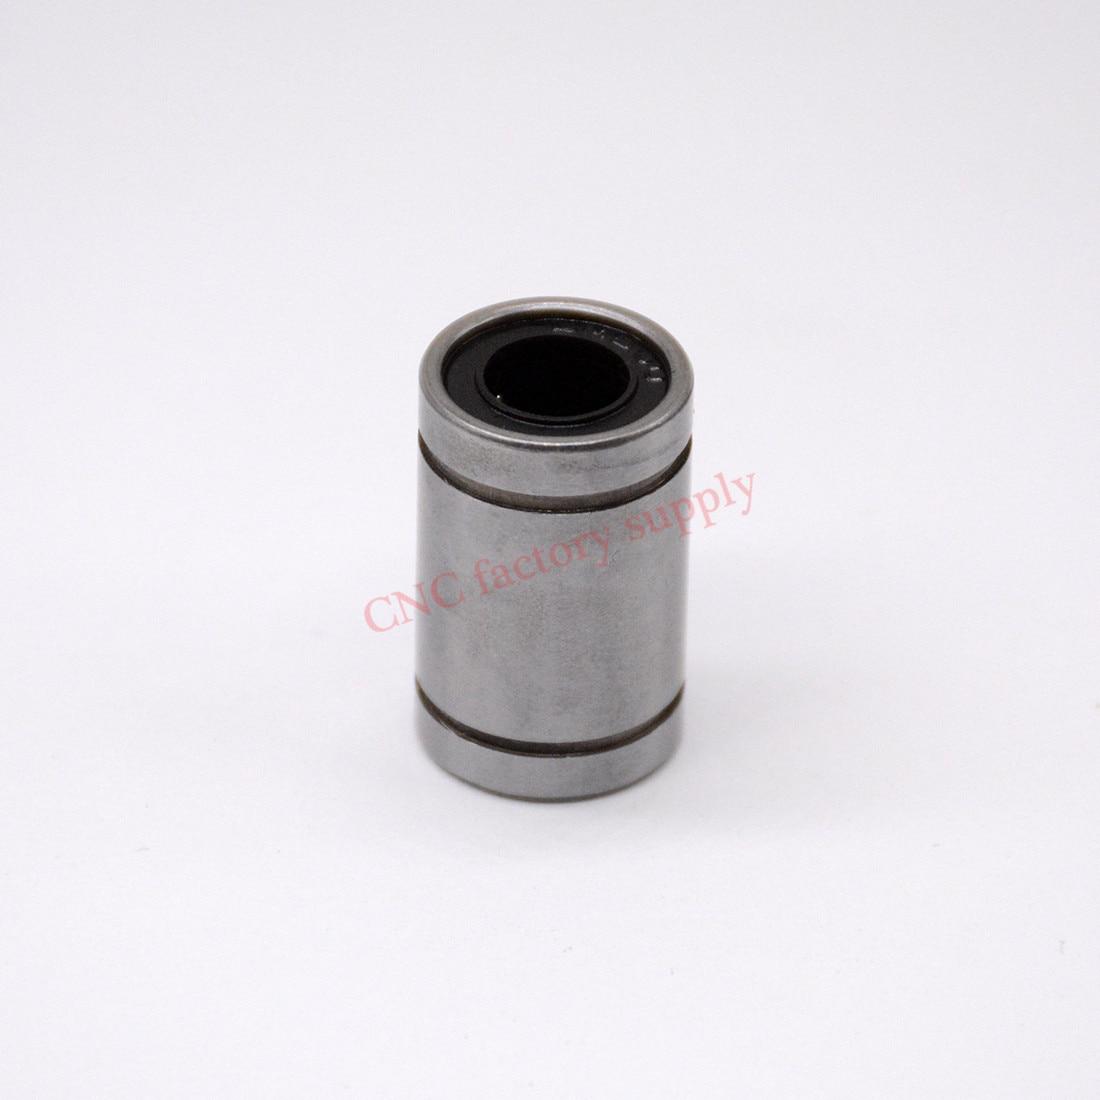 Hot sale  1pc LM4UU Linear Bushing 4mm CNC Linear Bearings hot sale 1pc lm12uu linear bushing 12mm cnc linear bearings